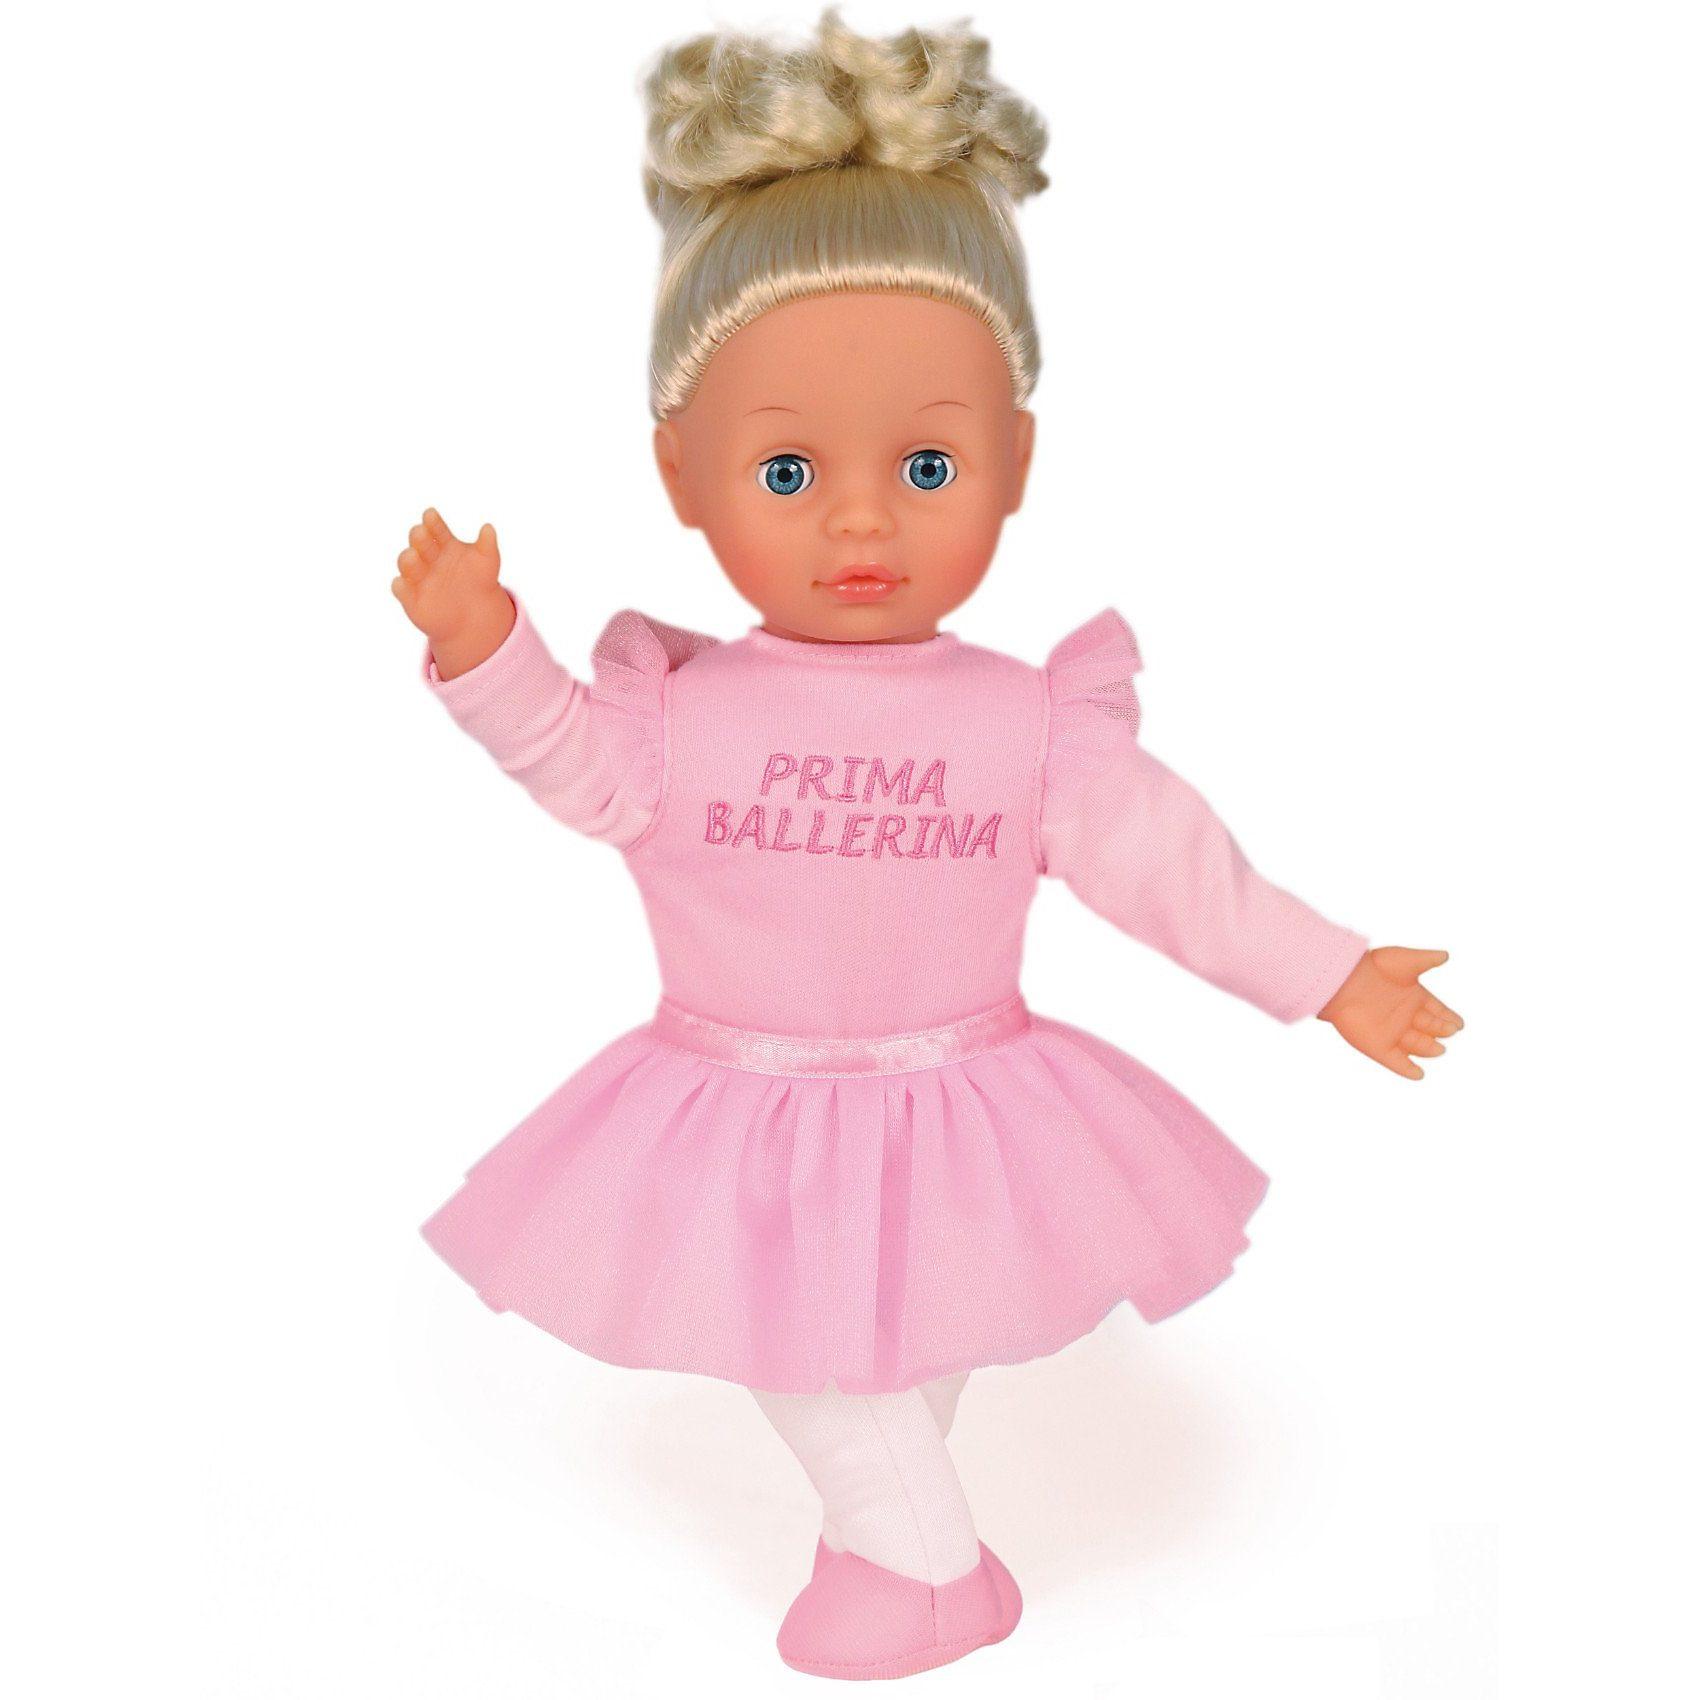 BAYER Puppe Prima Ballerina, 33 cm